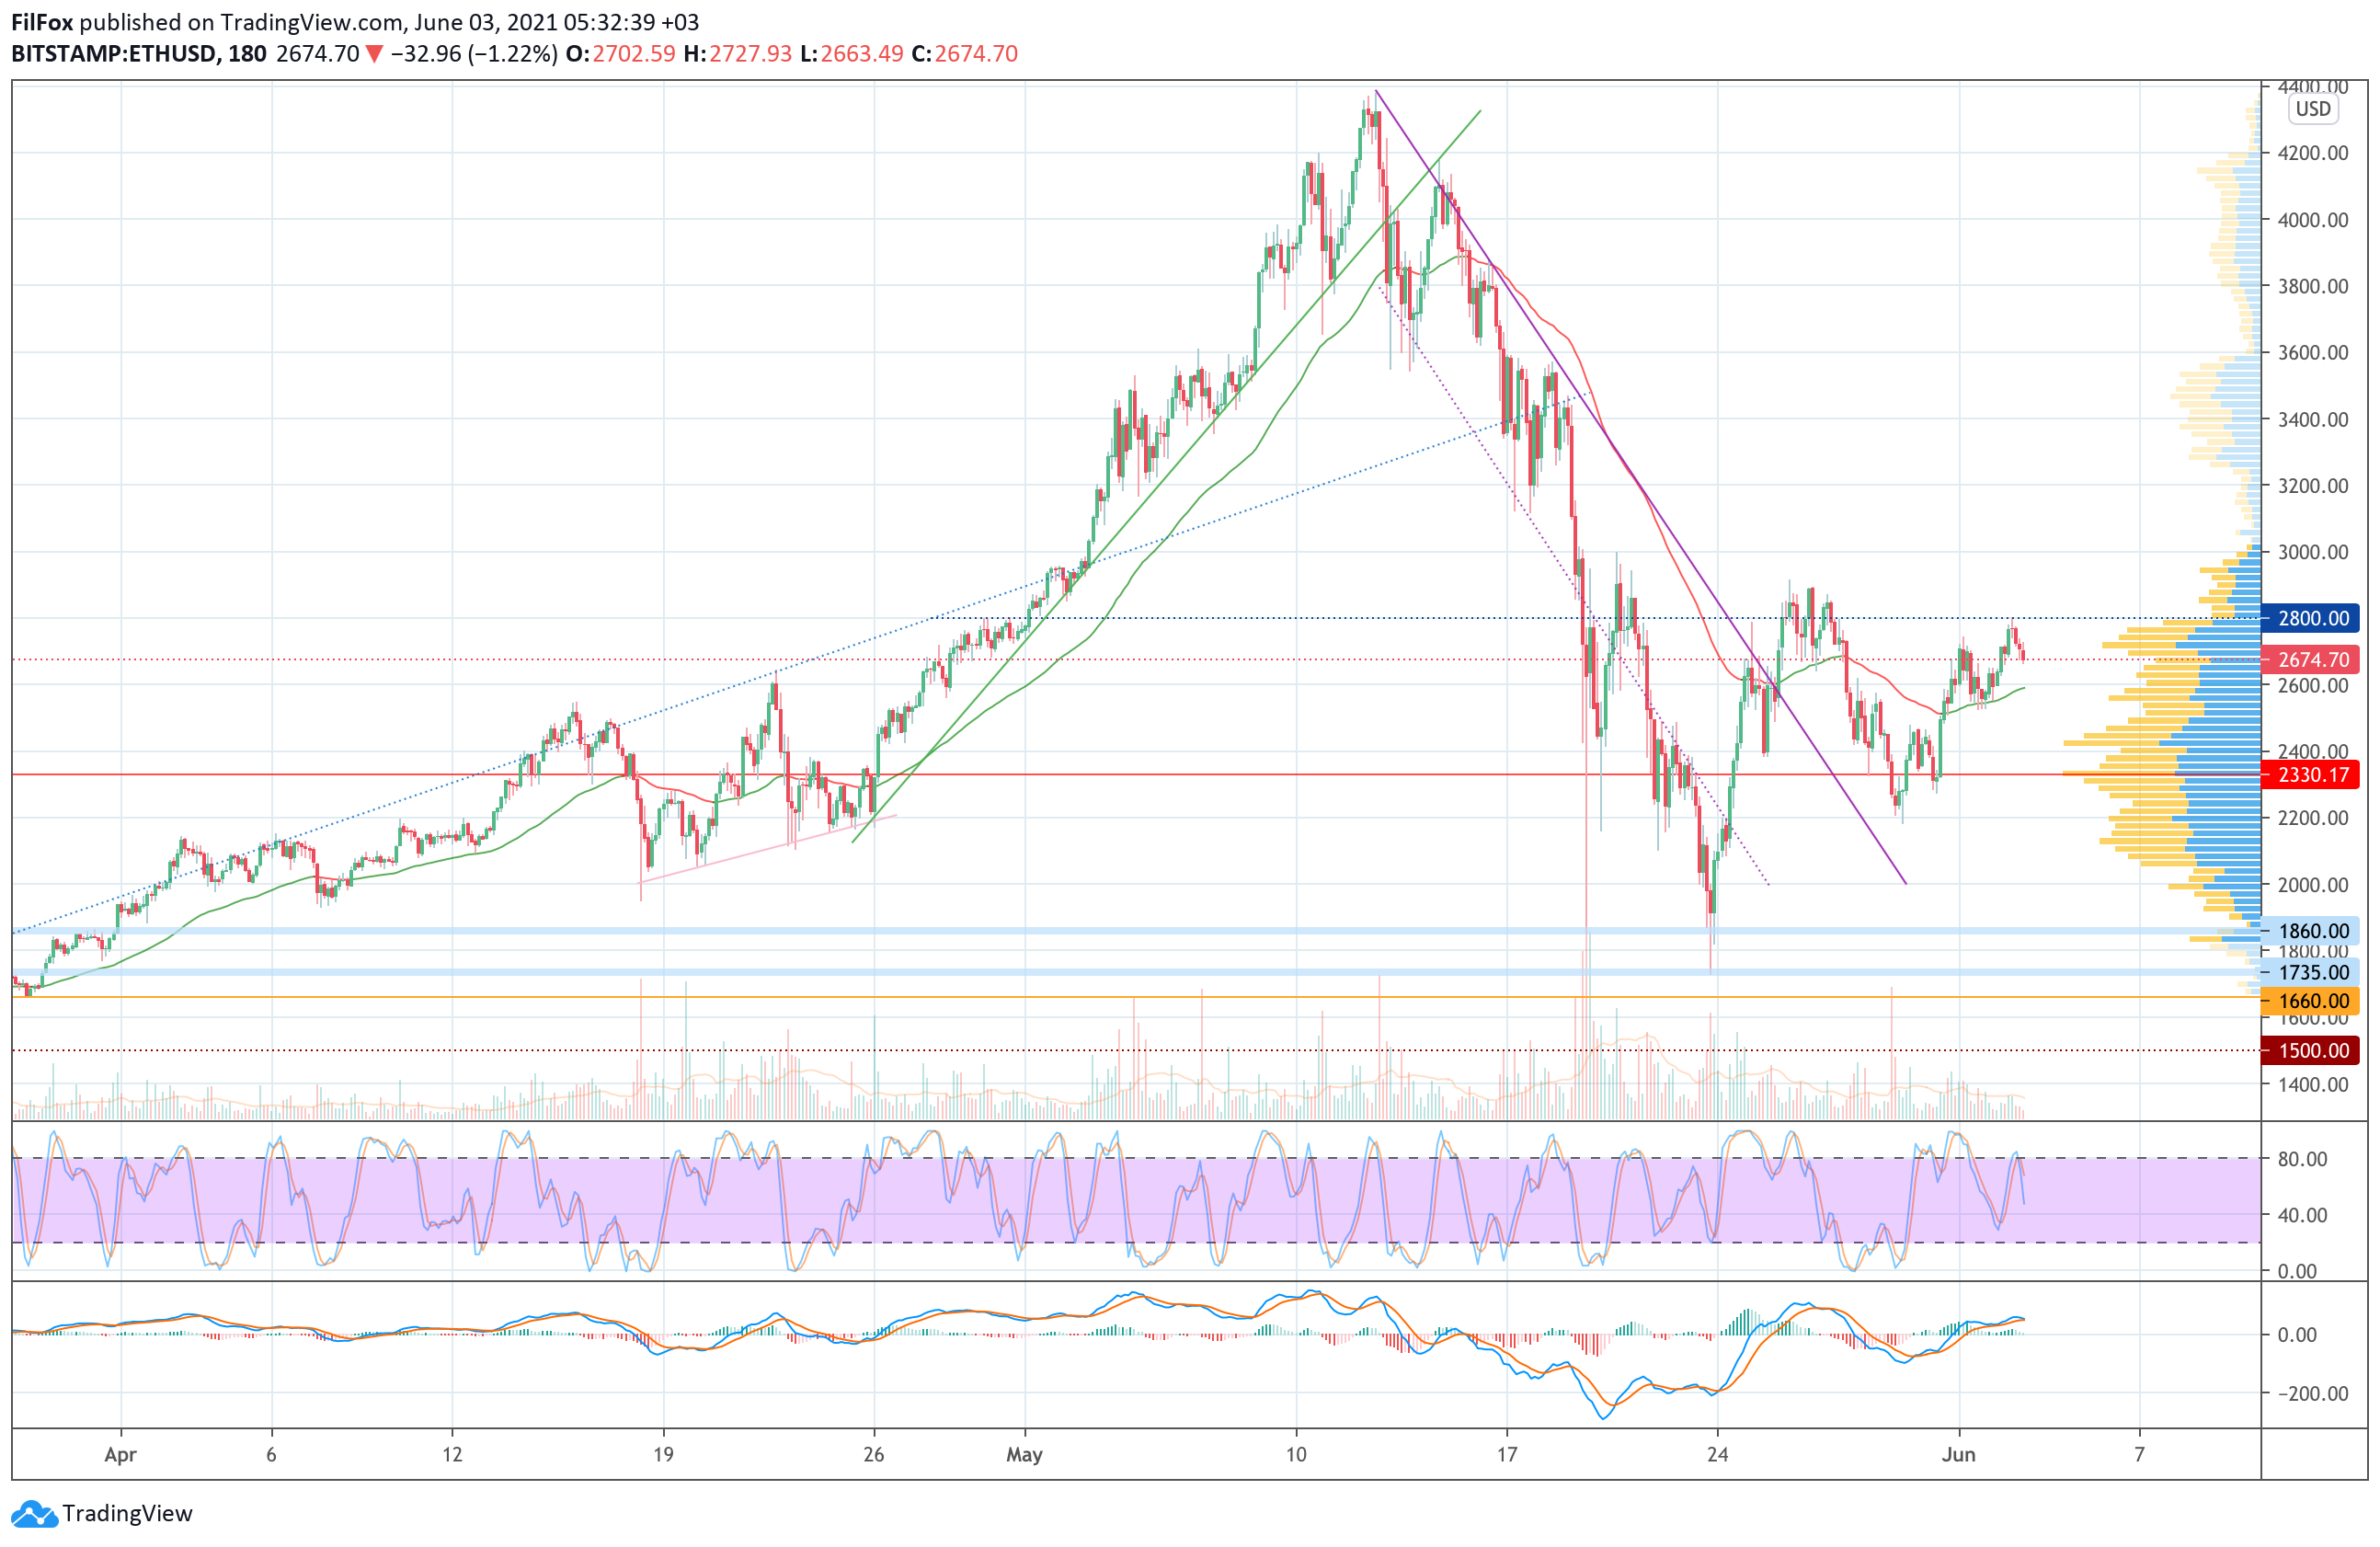 Анализ цен Bitcoin, Ethereum, XRP на 03.06.2021